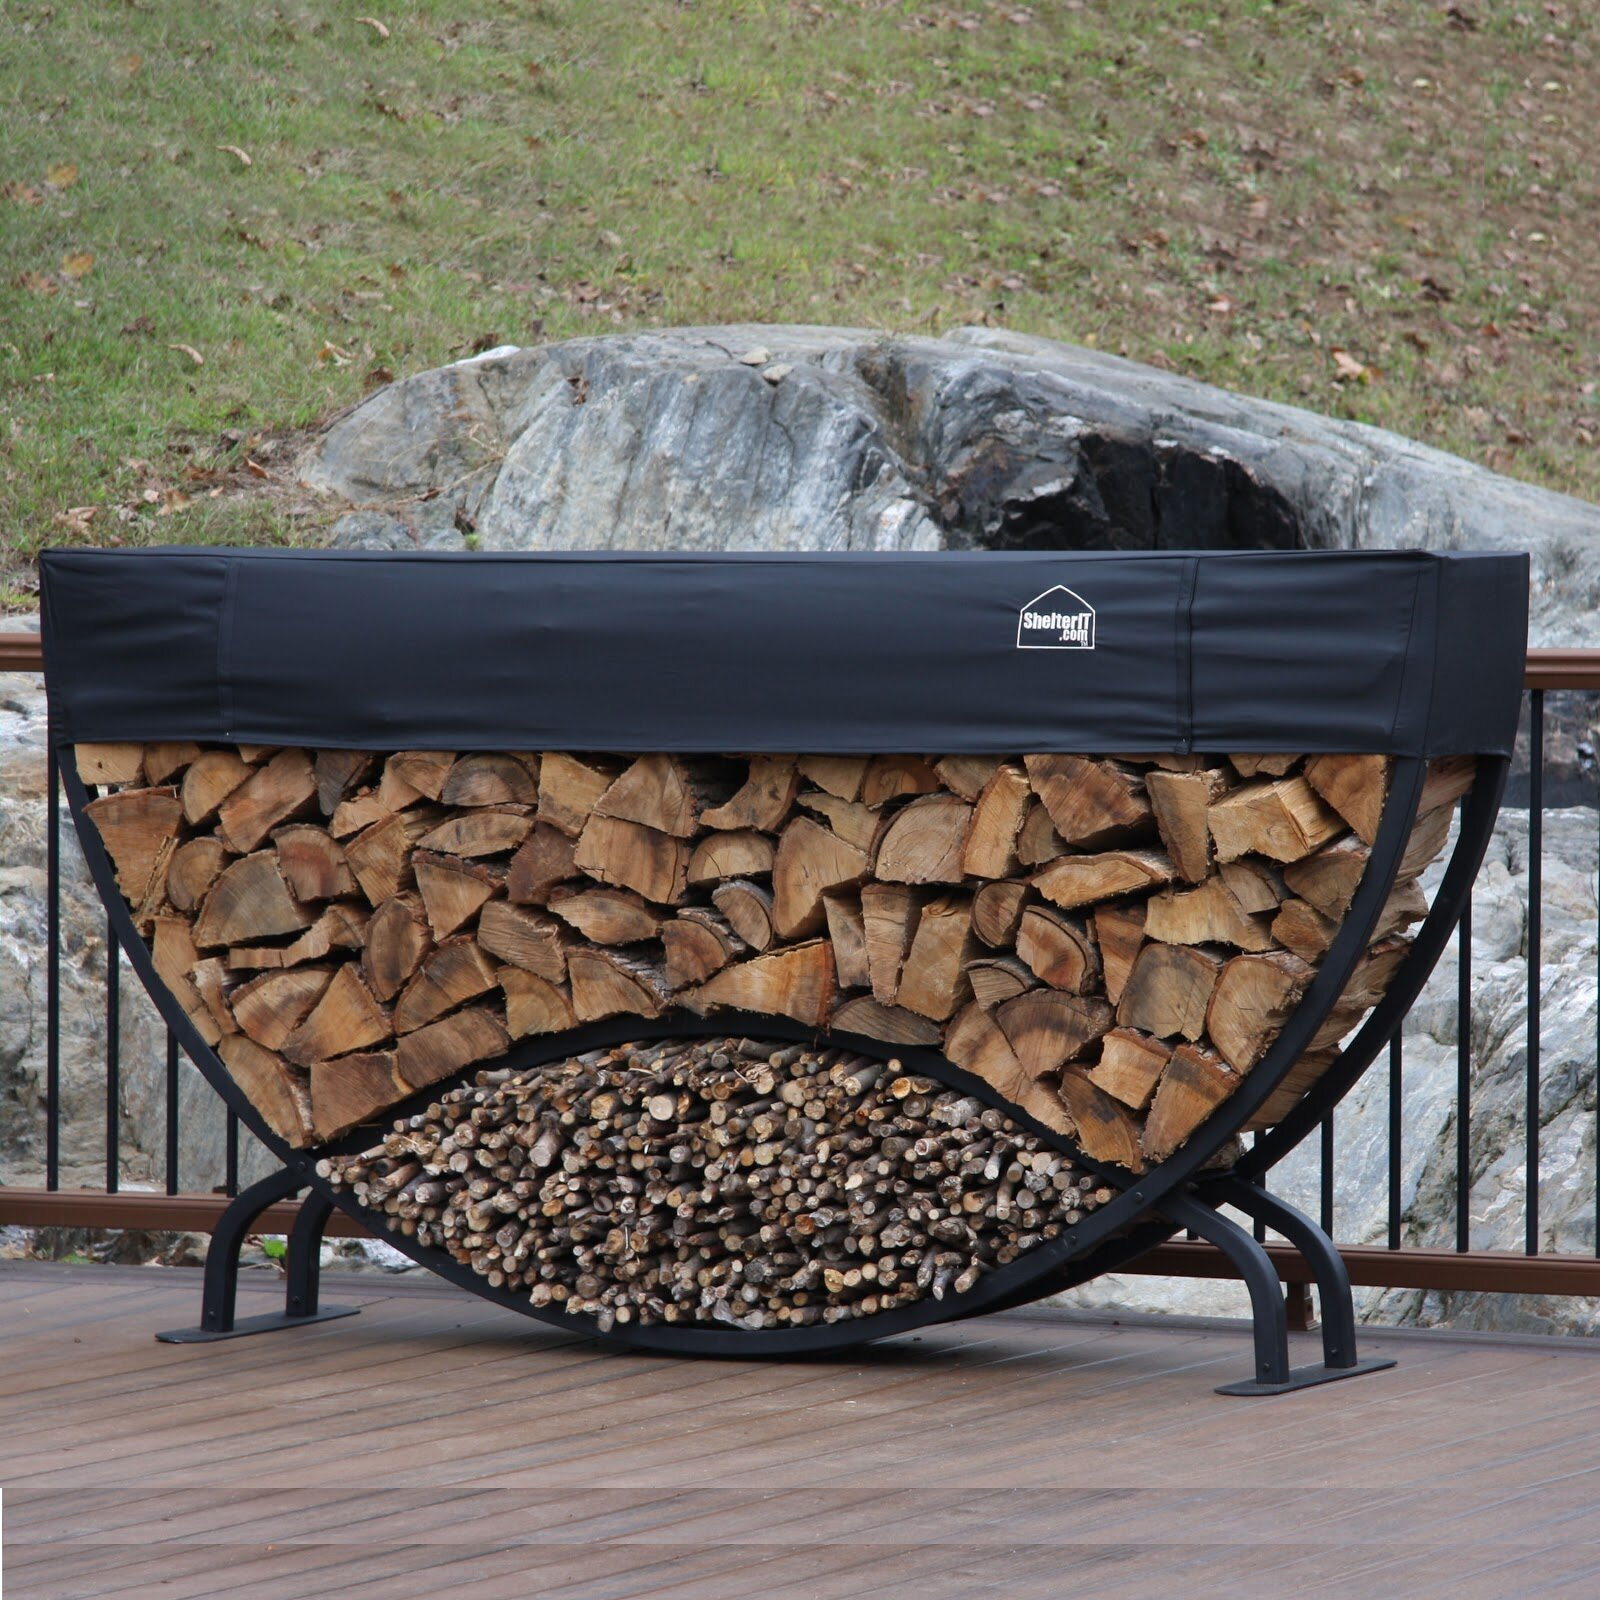 Symple Stuff Easterwood 8 Round Firewood Log Rack Reviews Wayfair